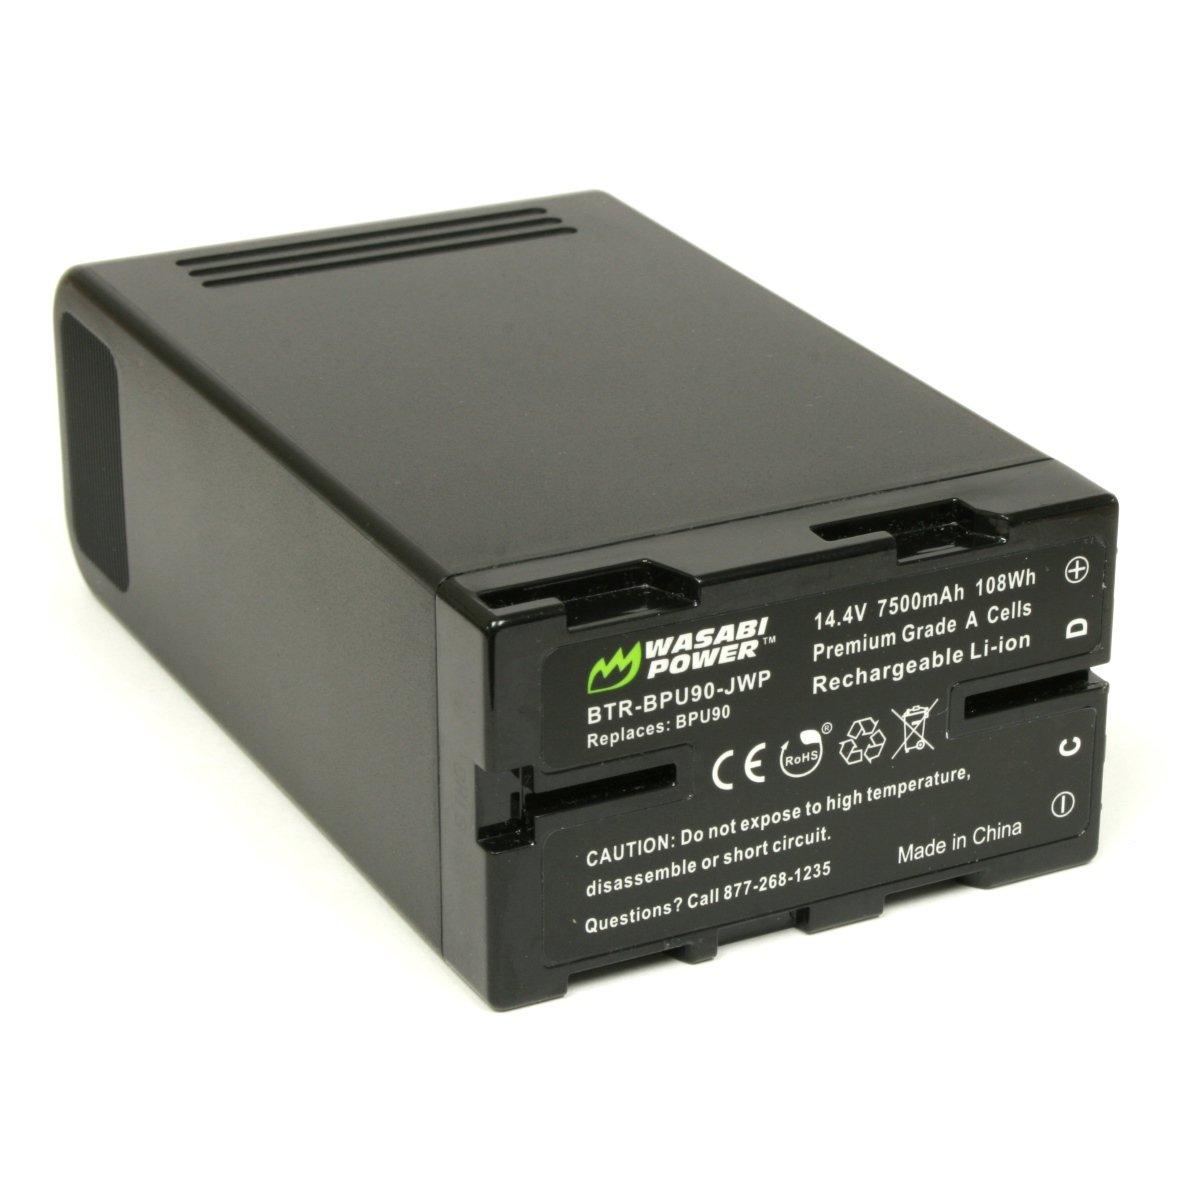 Wasabi Power Battery for Sony BP-U90 (14.4V, 7500mAh, 108Wh) and Sony PMW-100, PMW-150, PMW-160, PMW-200, PMW-300, PMW-EX1, PMW-EX1R, PMW-EX3, PMW-EX160, PMW-EX260, PMW-EX280, PMW-F3, PXW-FS5, PXW-FS7